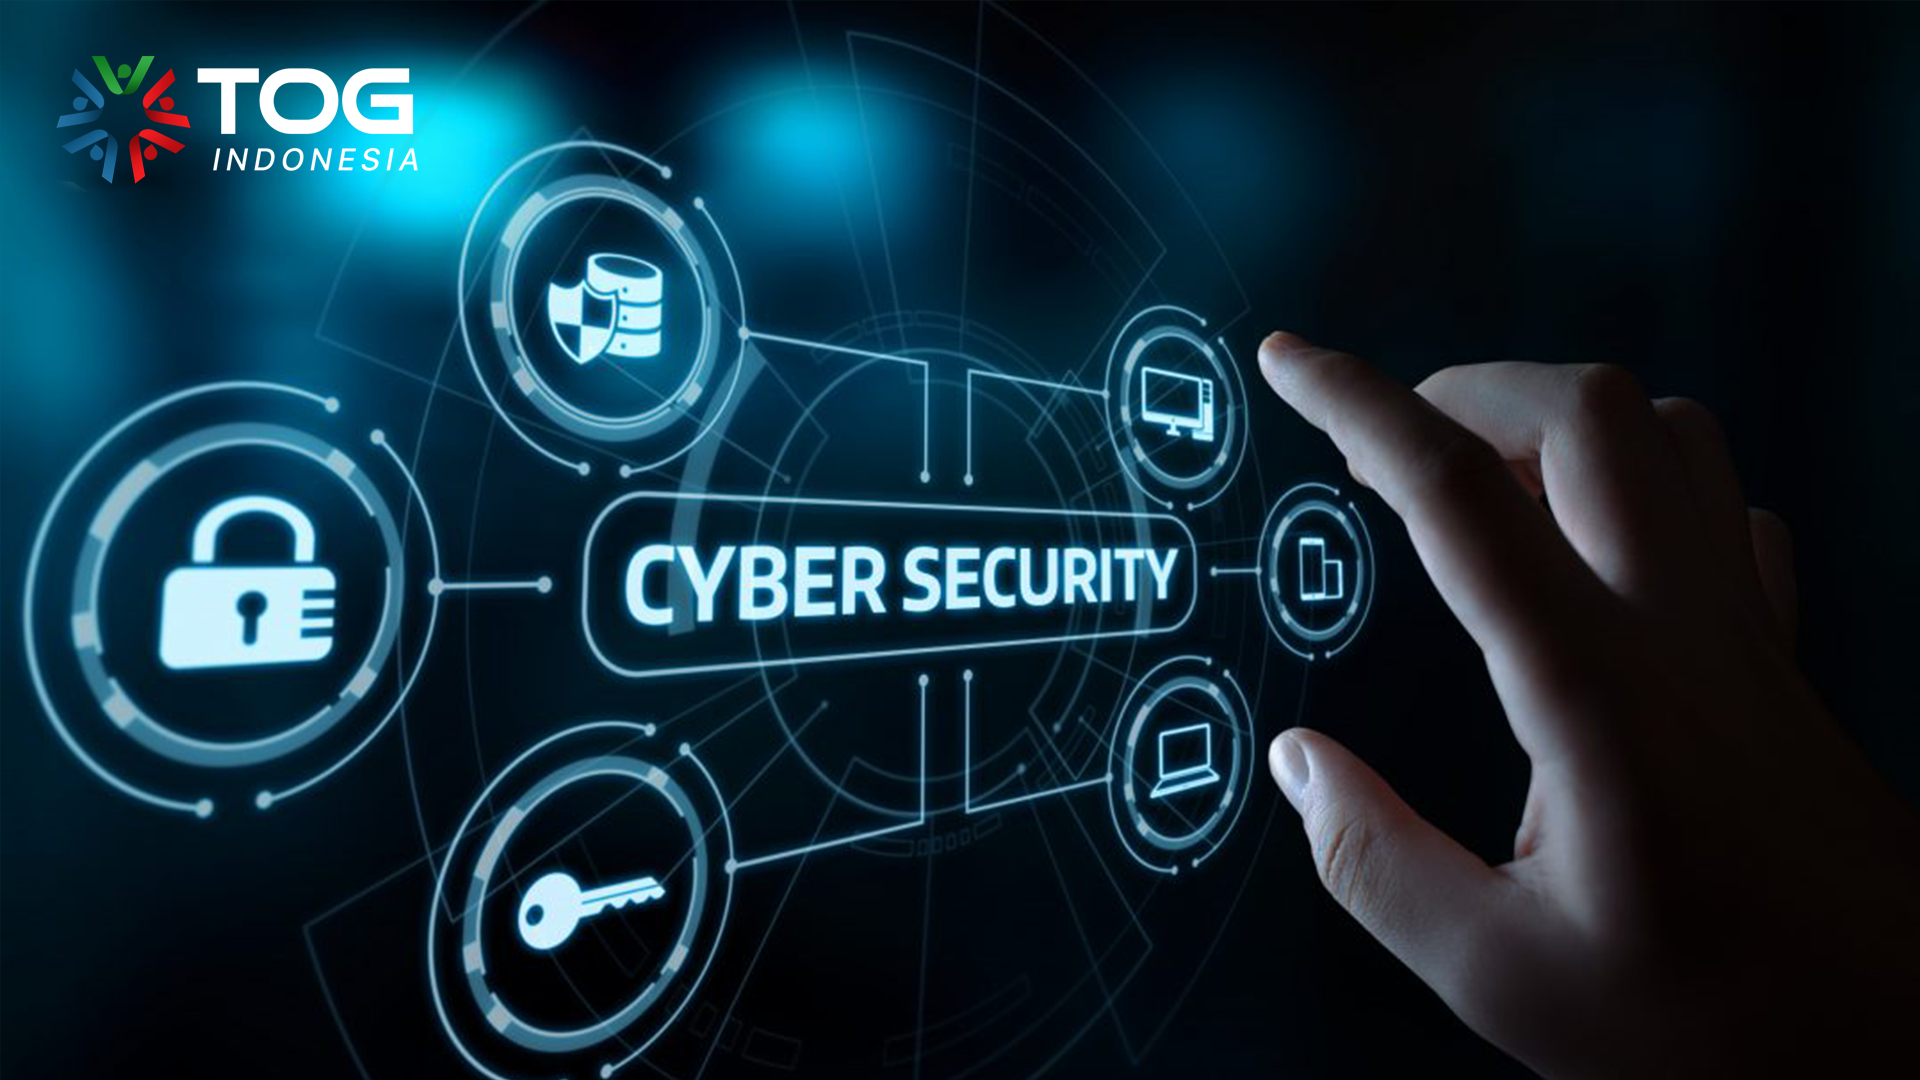 Skill Cyber Security yang Wajib Dikuasai Agar Dapat Gaji Tinggi